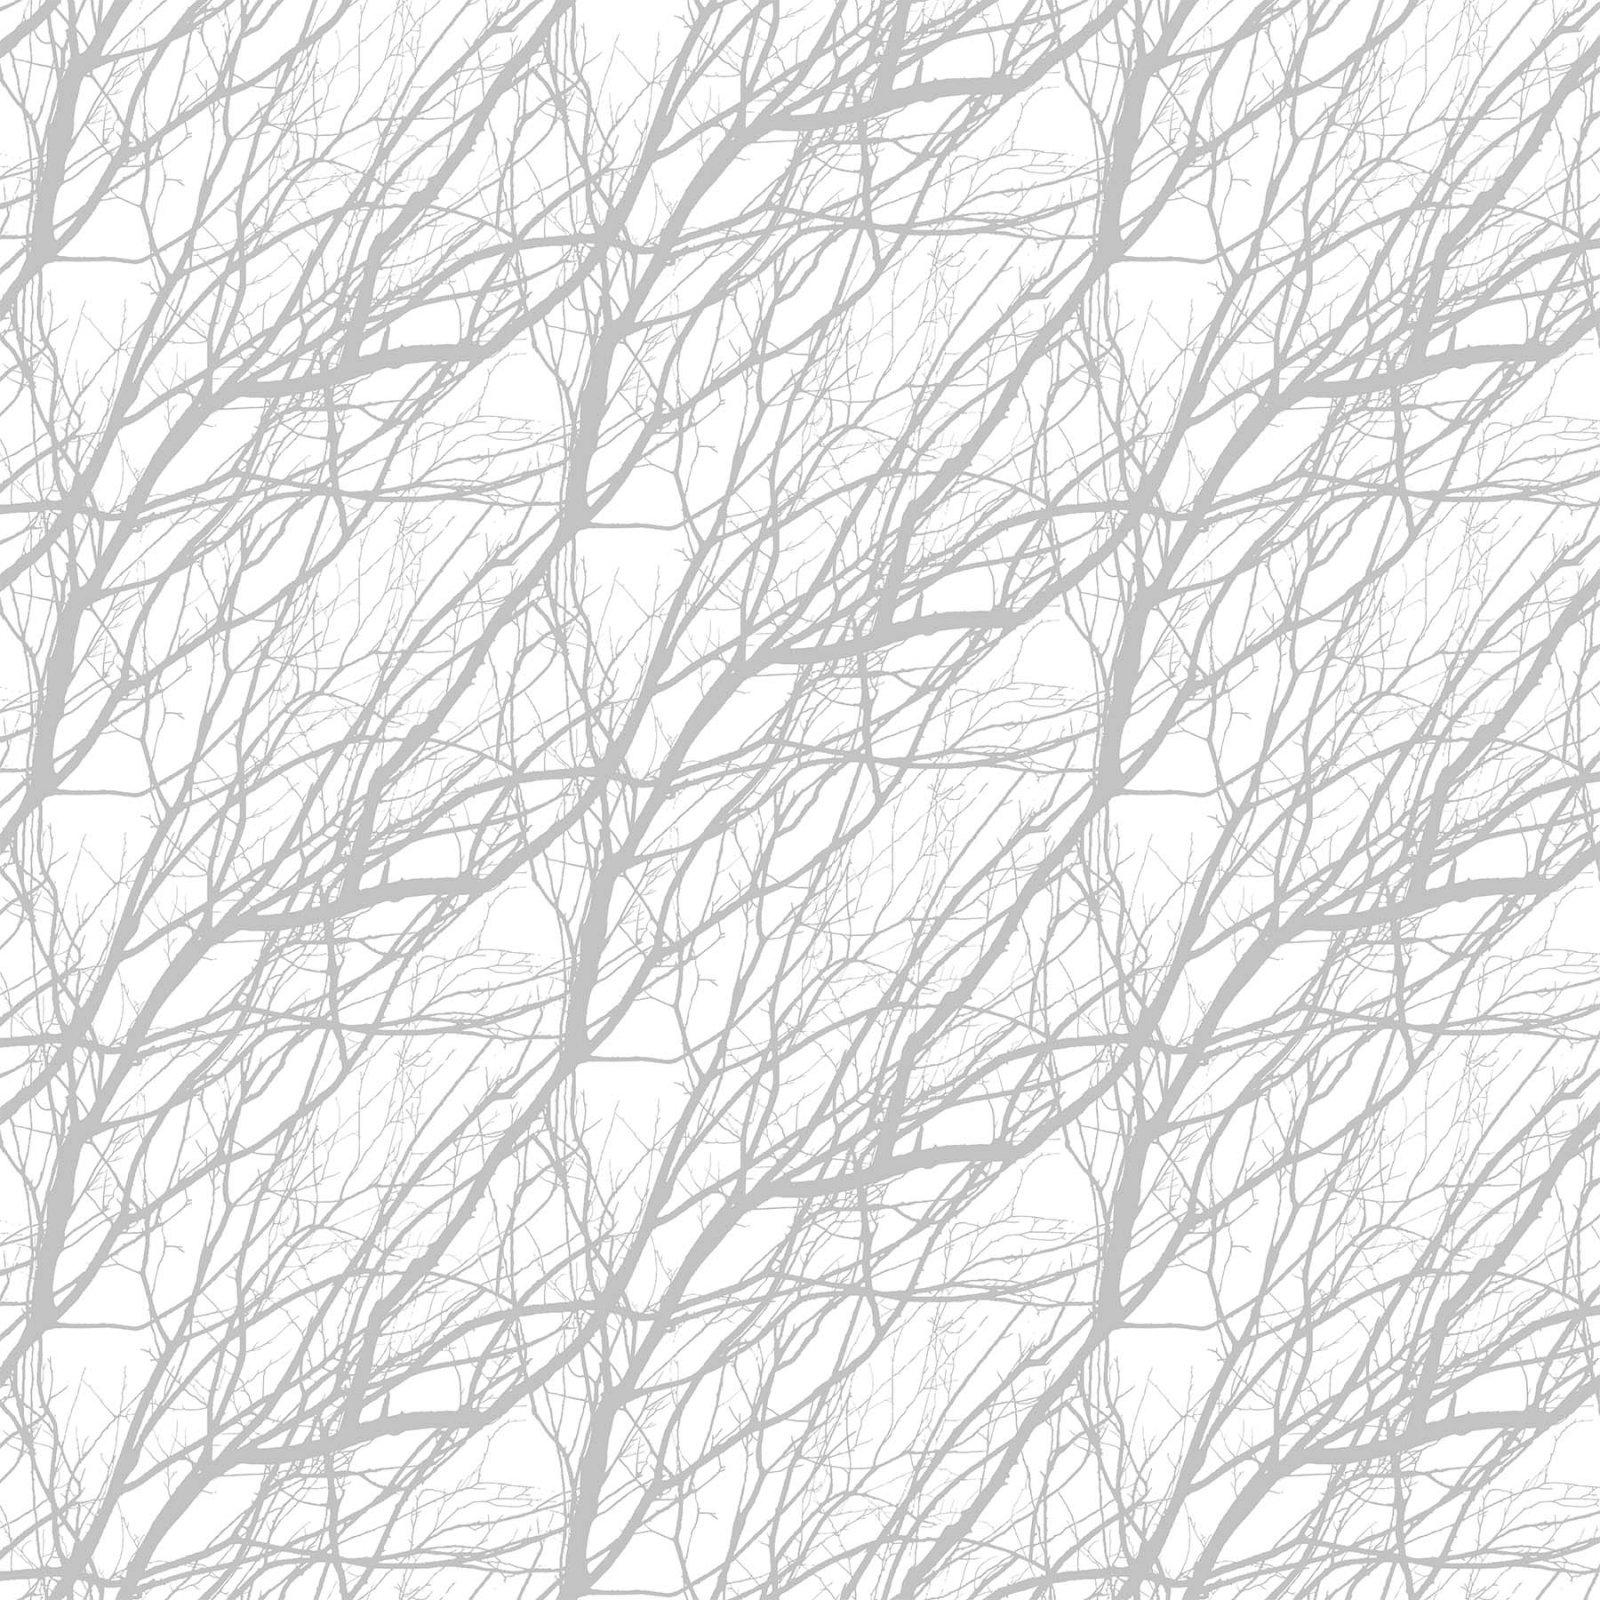 Silhouette Branches Gray/White